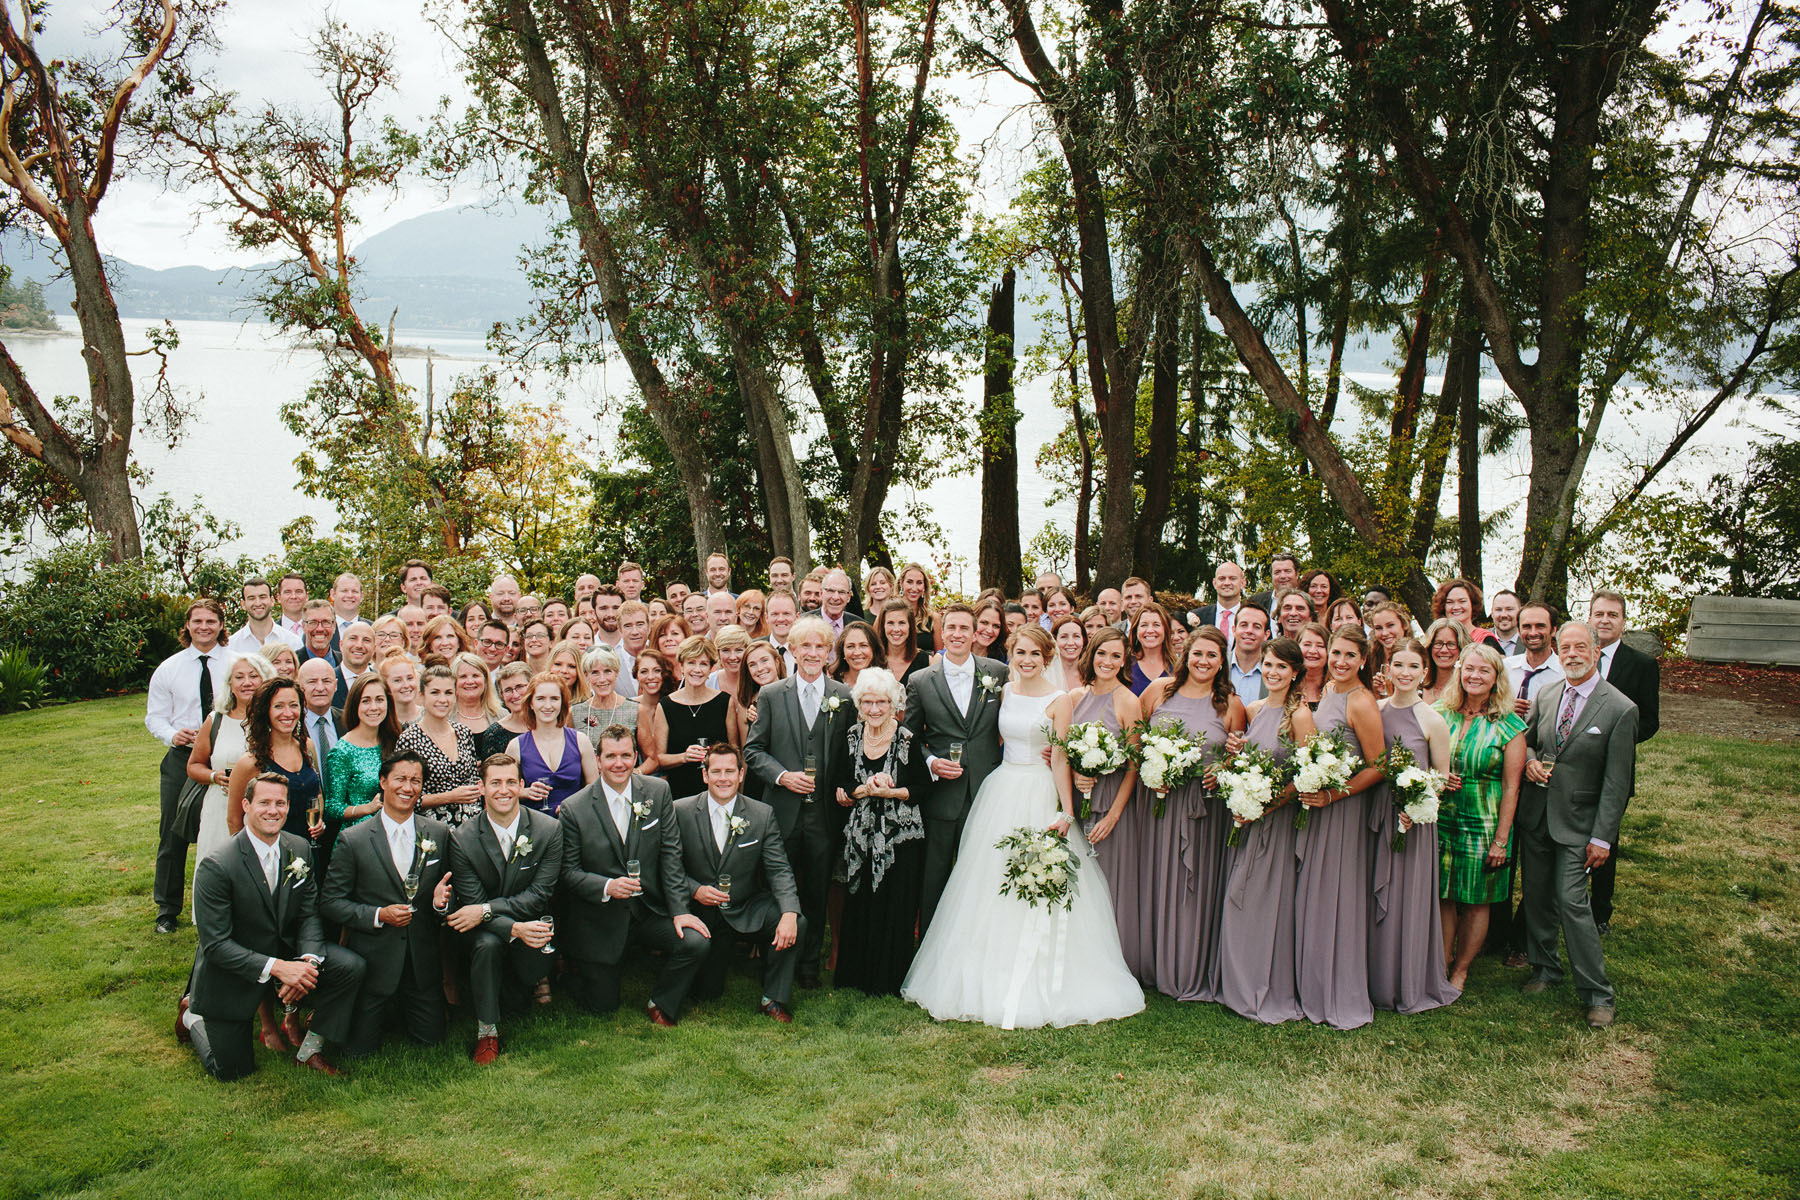 thetis-island-wedding-photographer-rp-rn-104.jpg